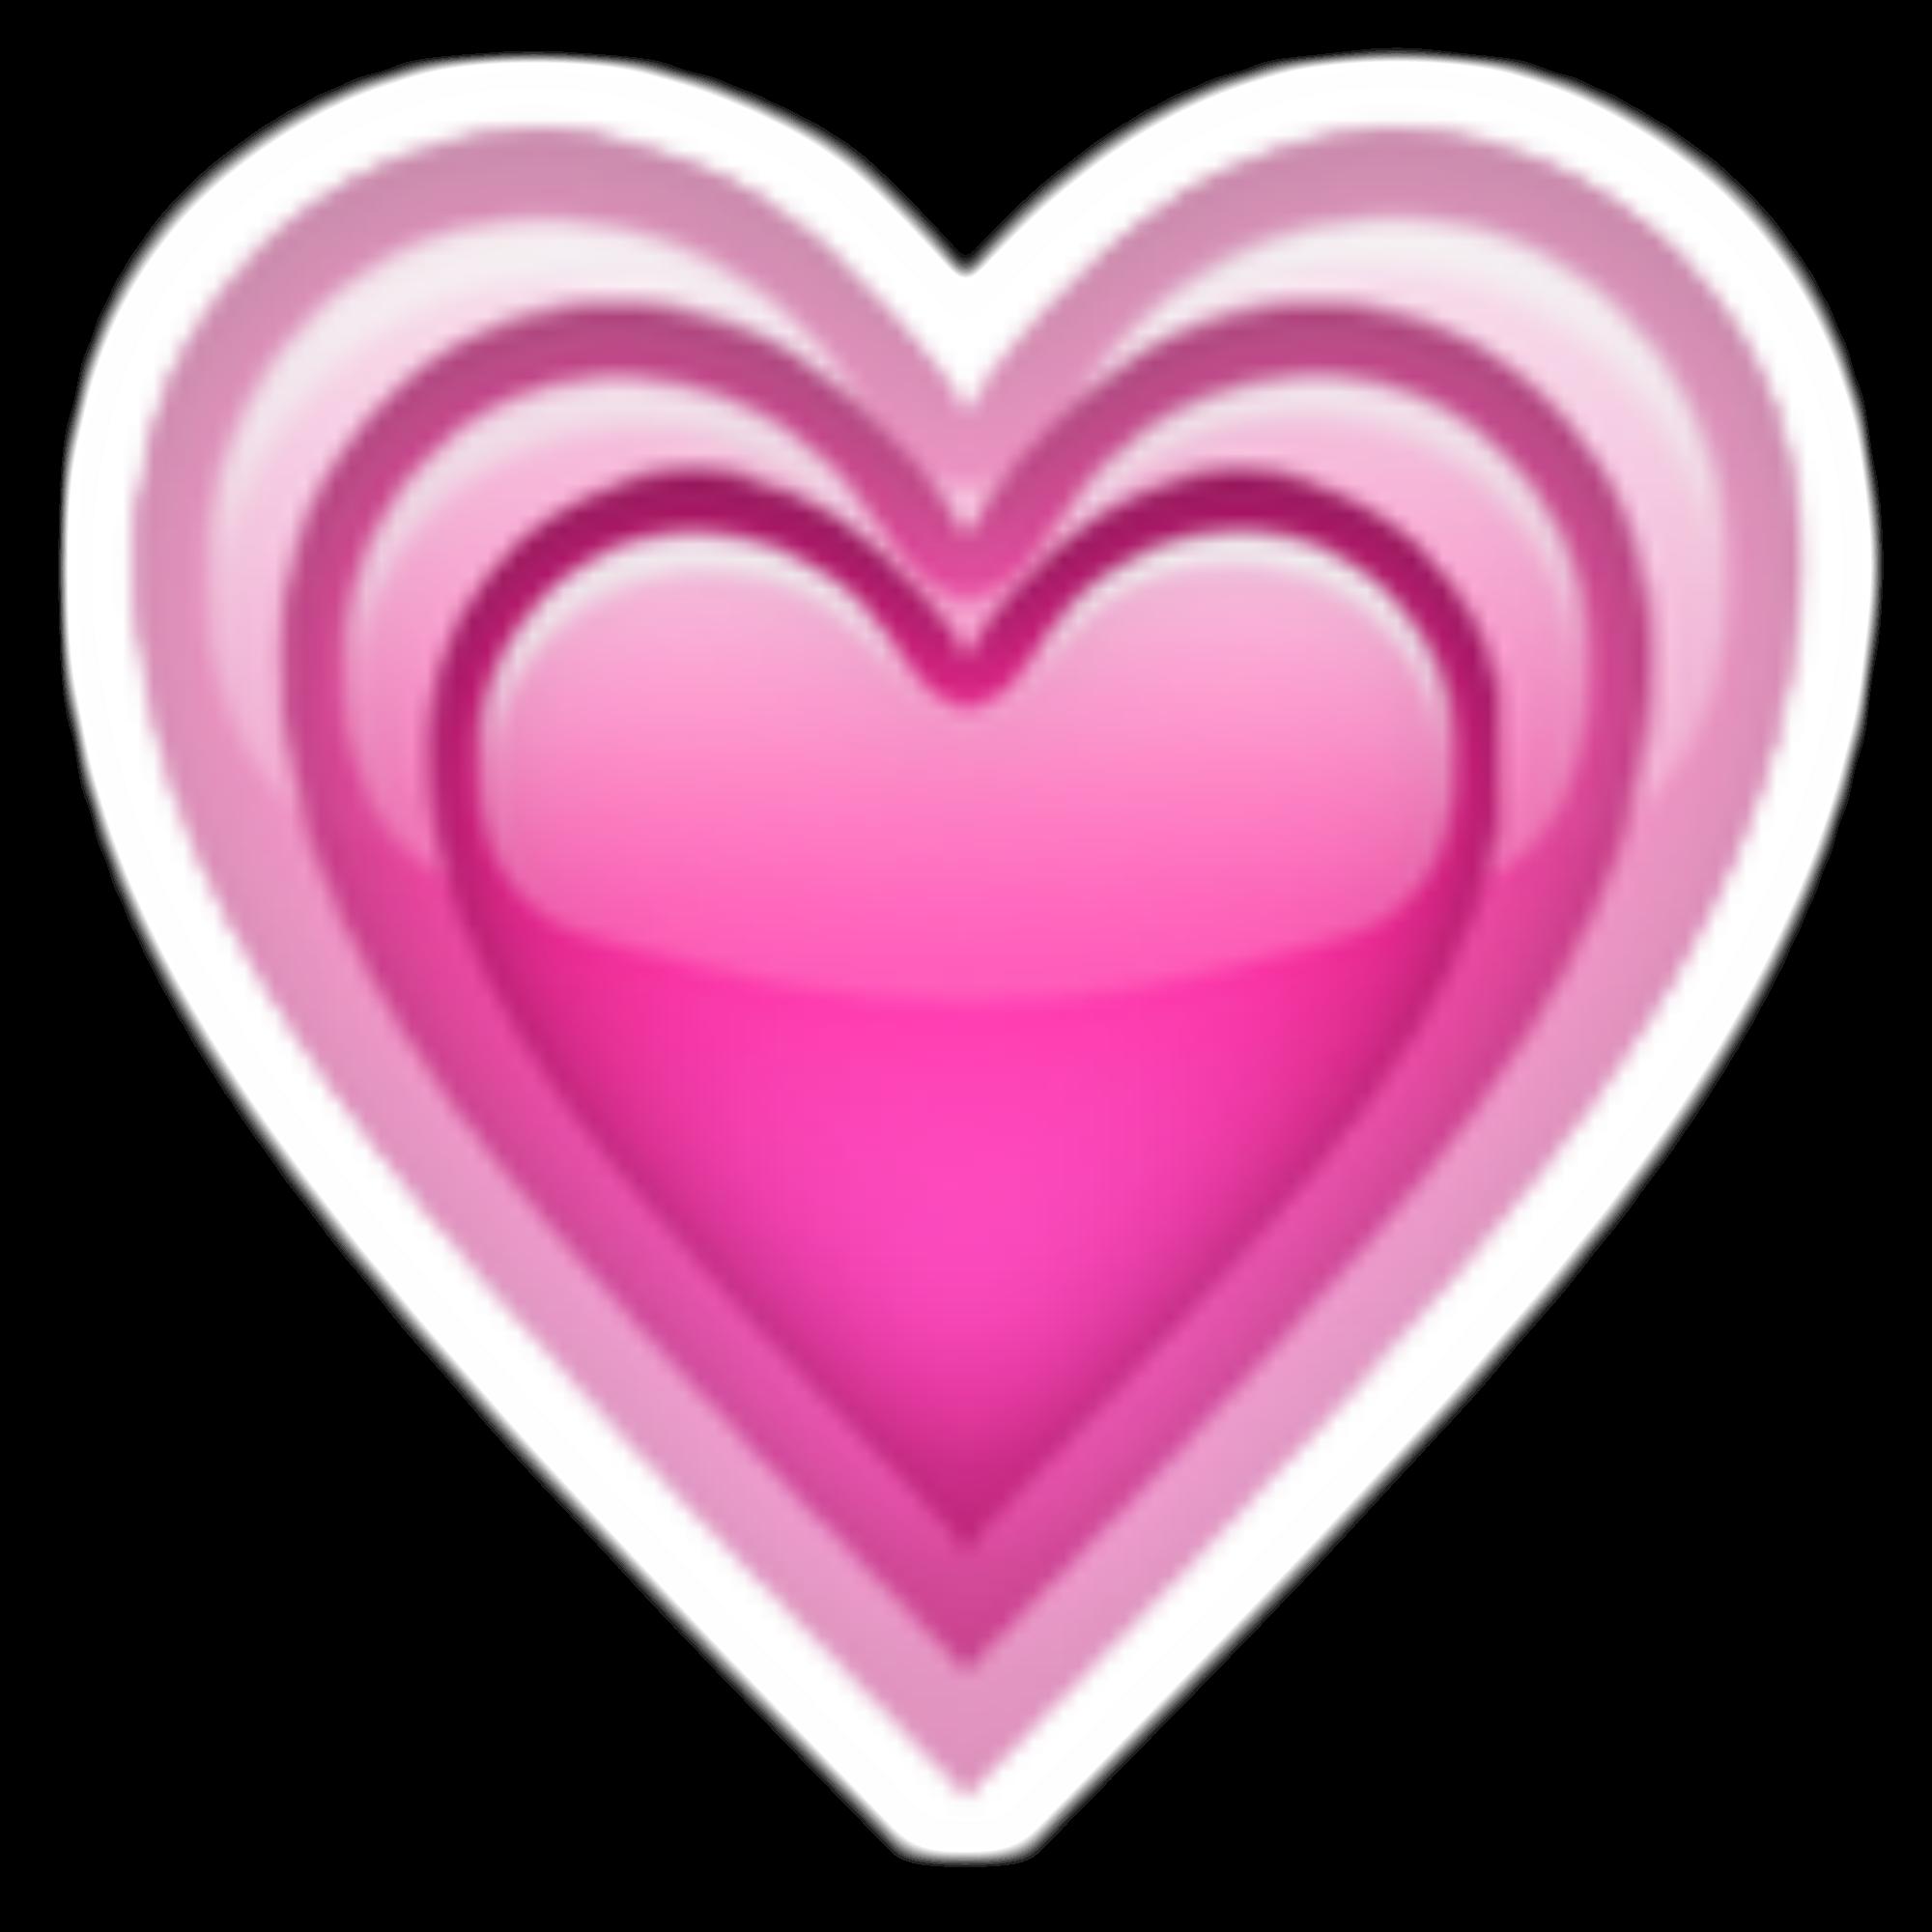 Growing heart clipart jpg download Images of Emoji Heart - #SpaceHero jpg download